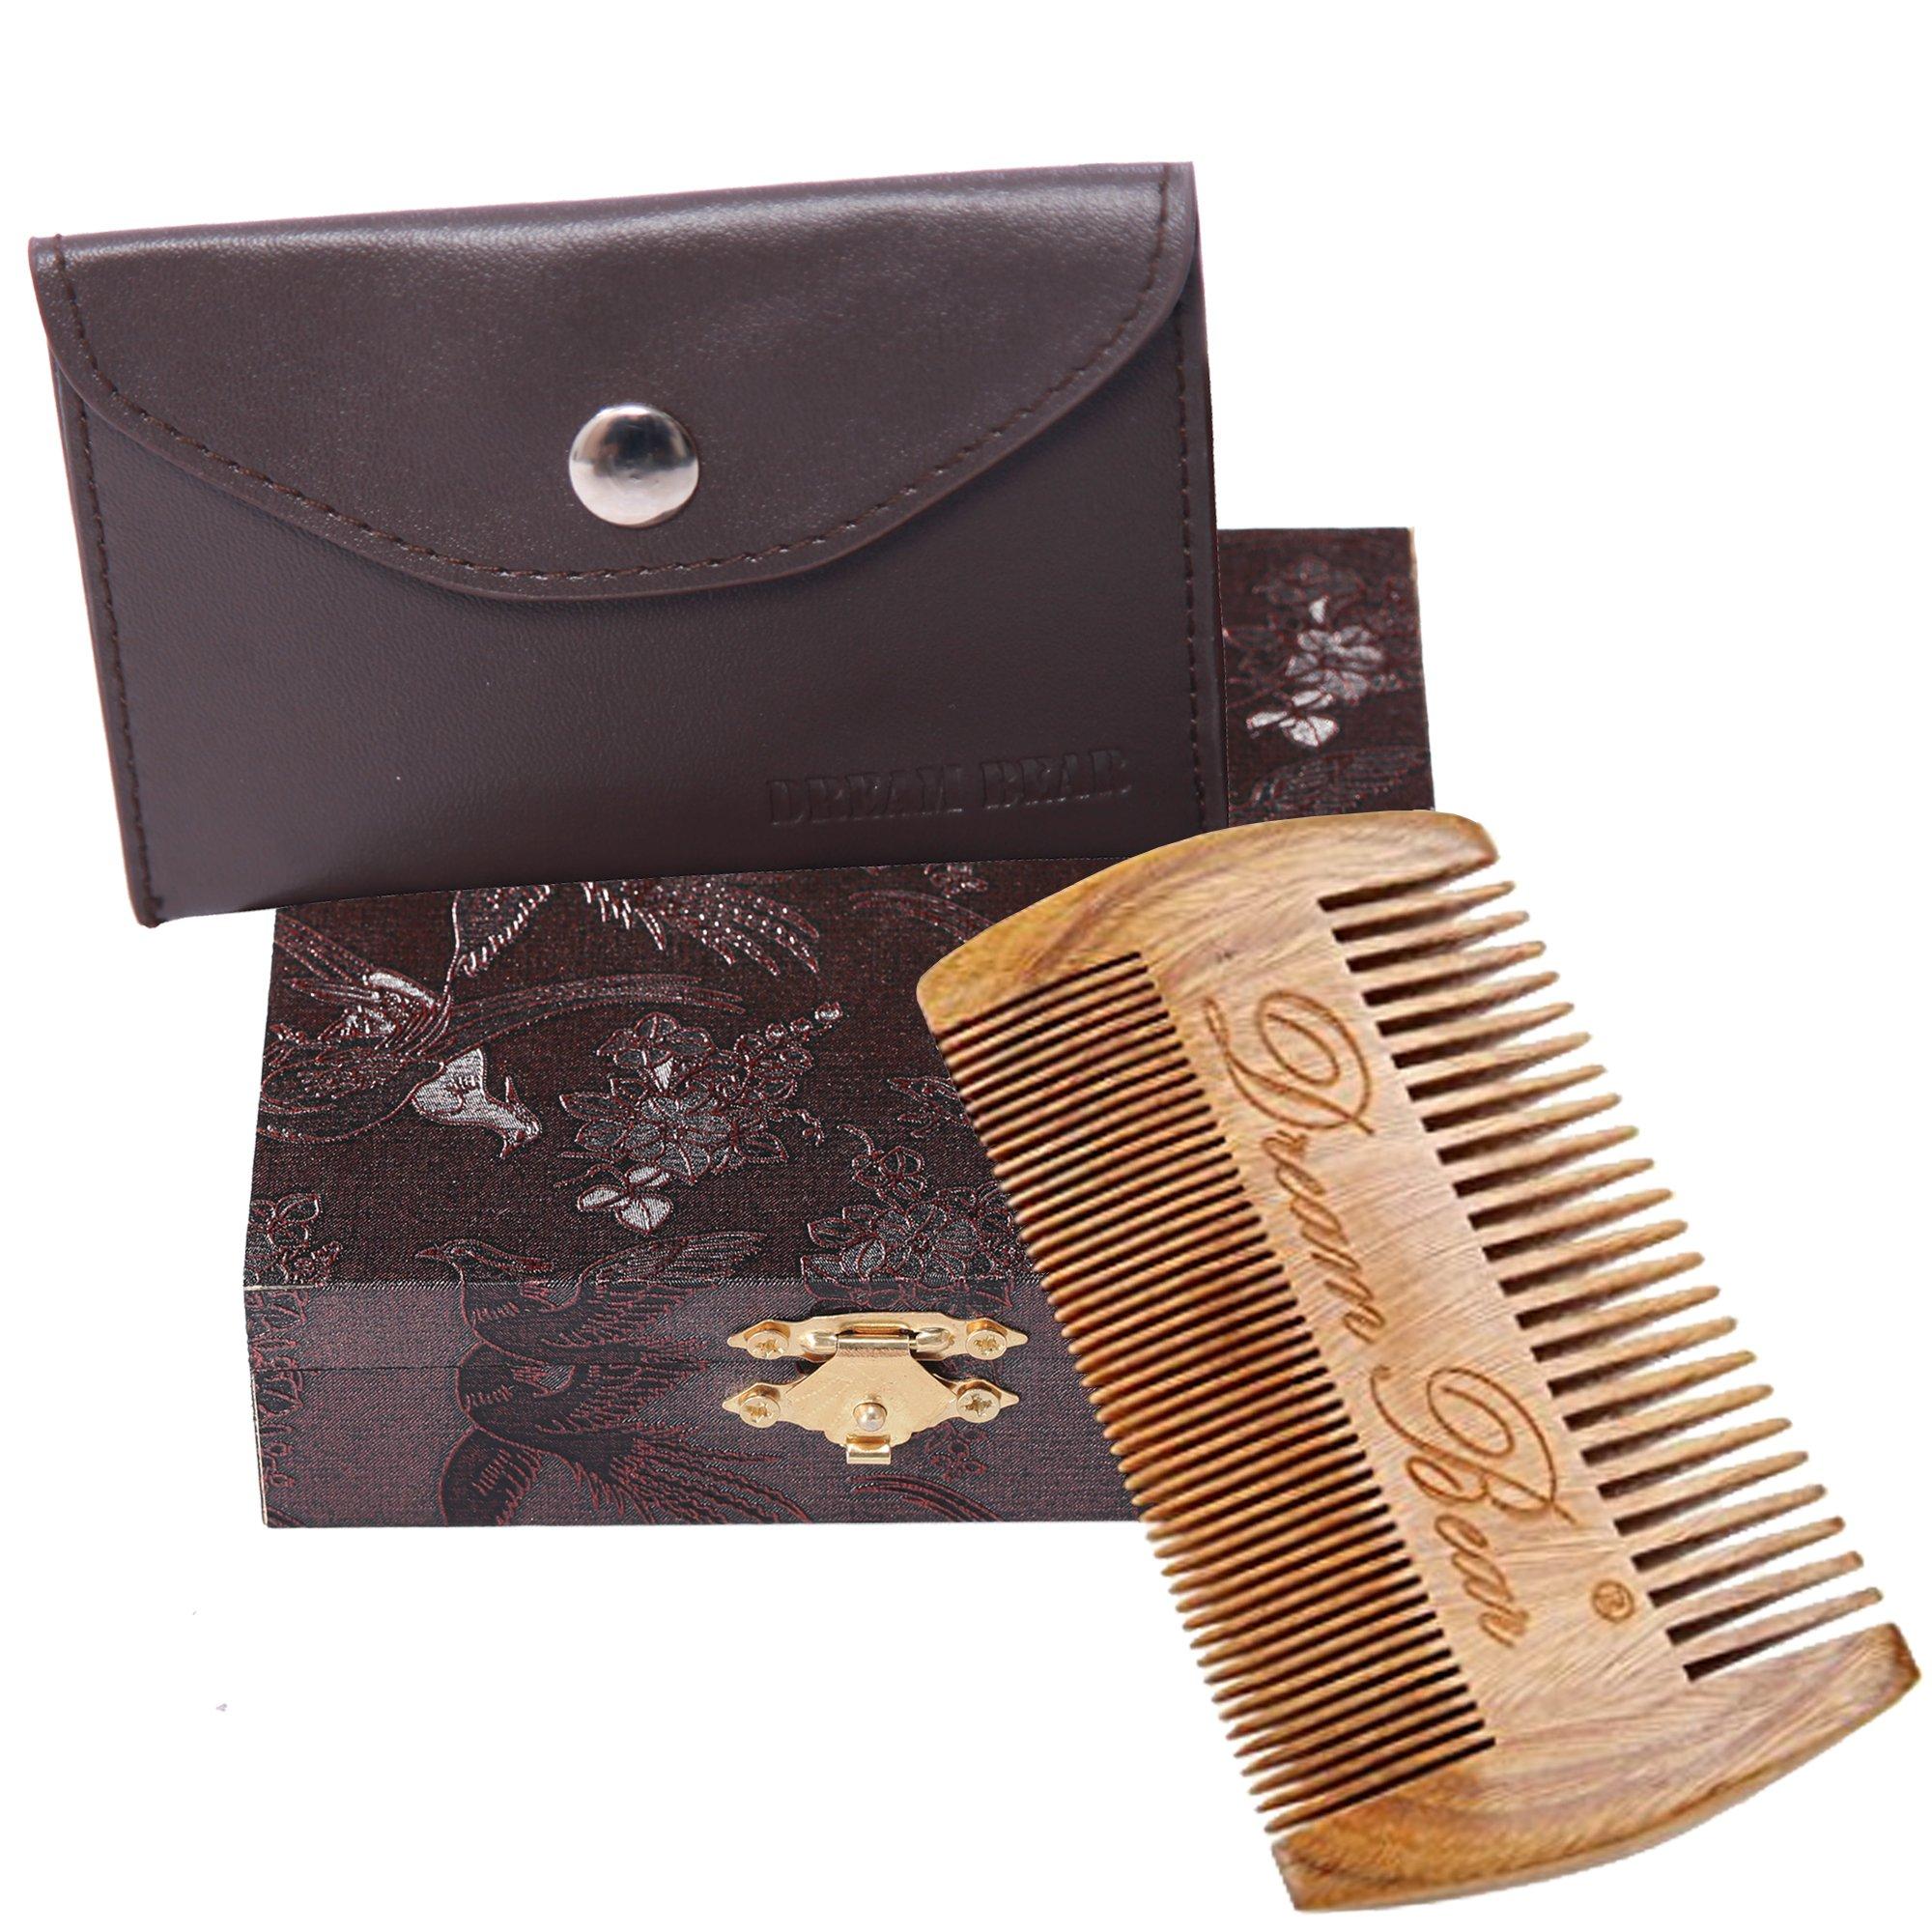 DREAMBEAR®100%HandmadeGreenSandalwoodComb,DoubleDifferentDensitiesBeardComb,NaturalFragrance,noStatic,UseforMustache&Hair+(perfectGiftboxPackaging).